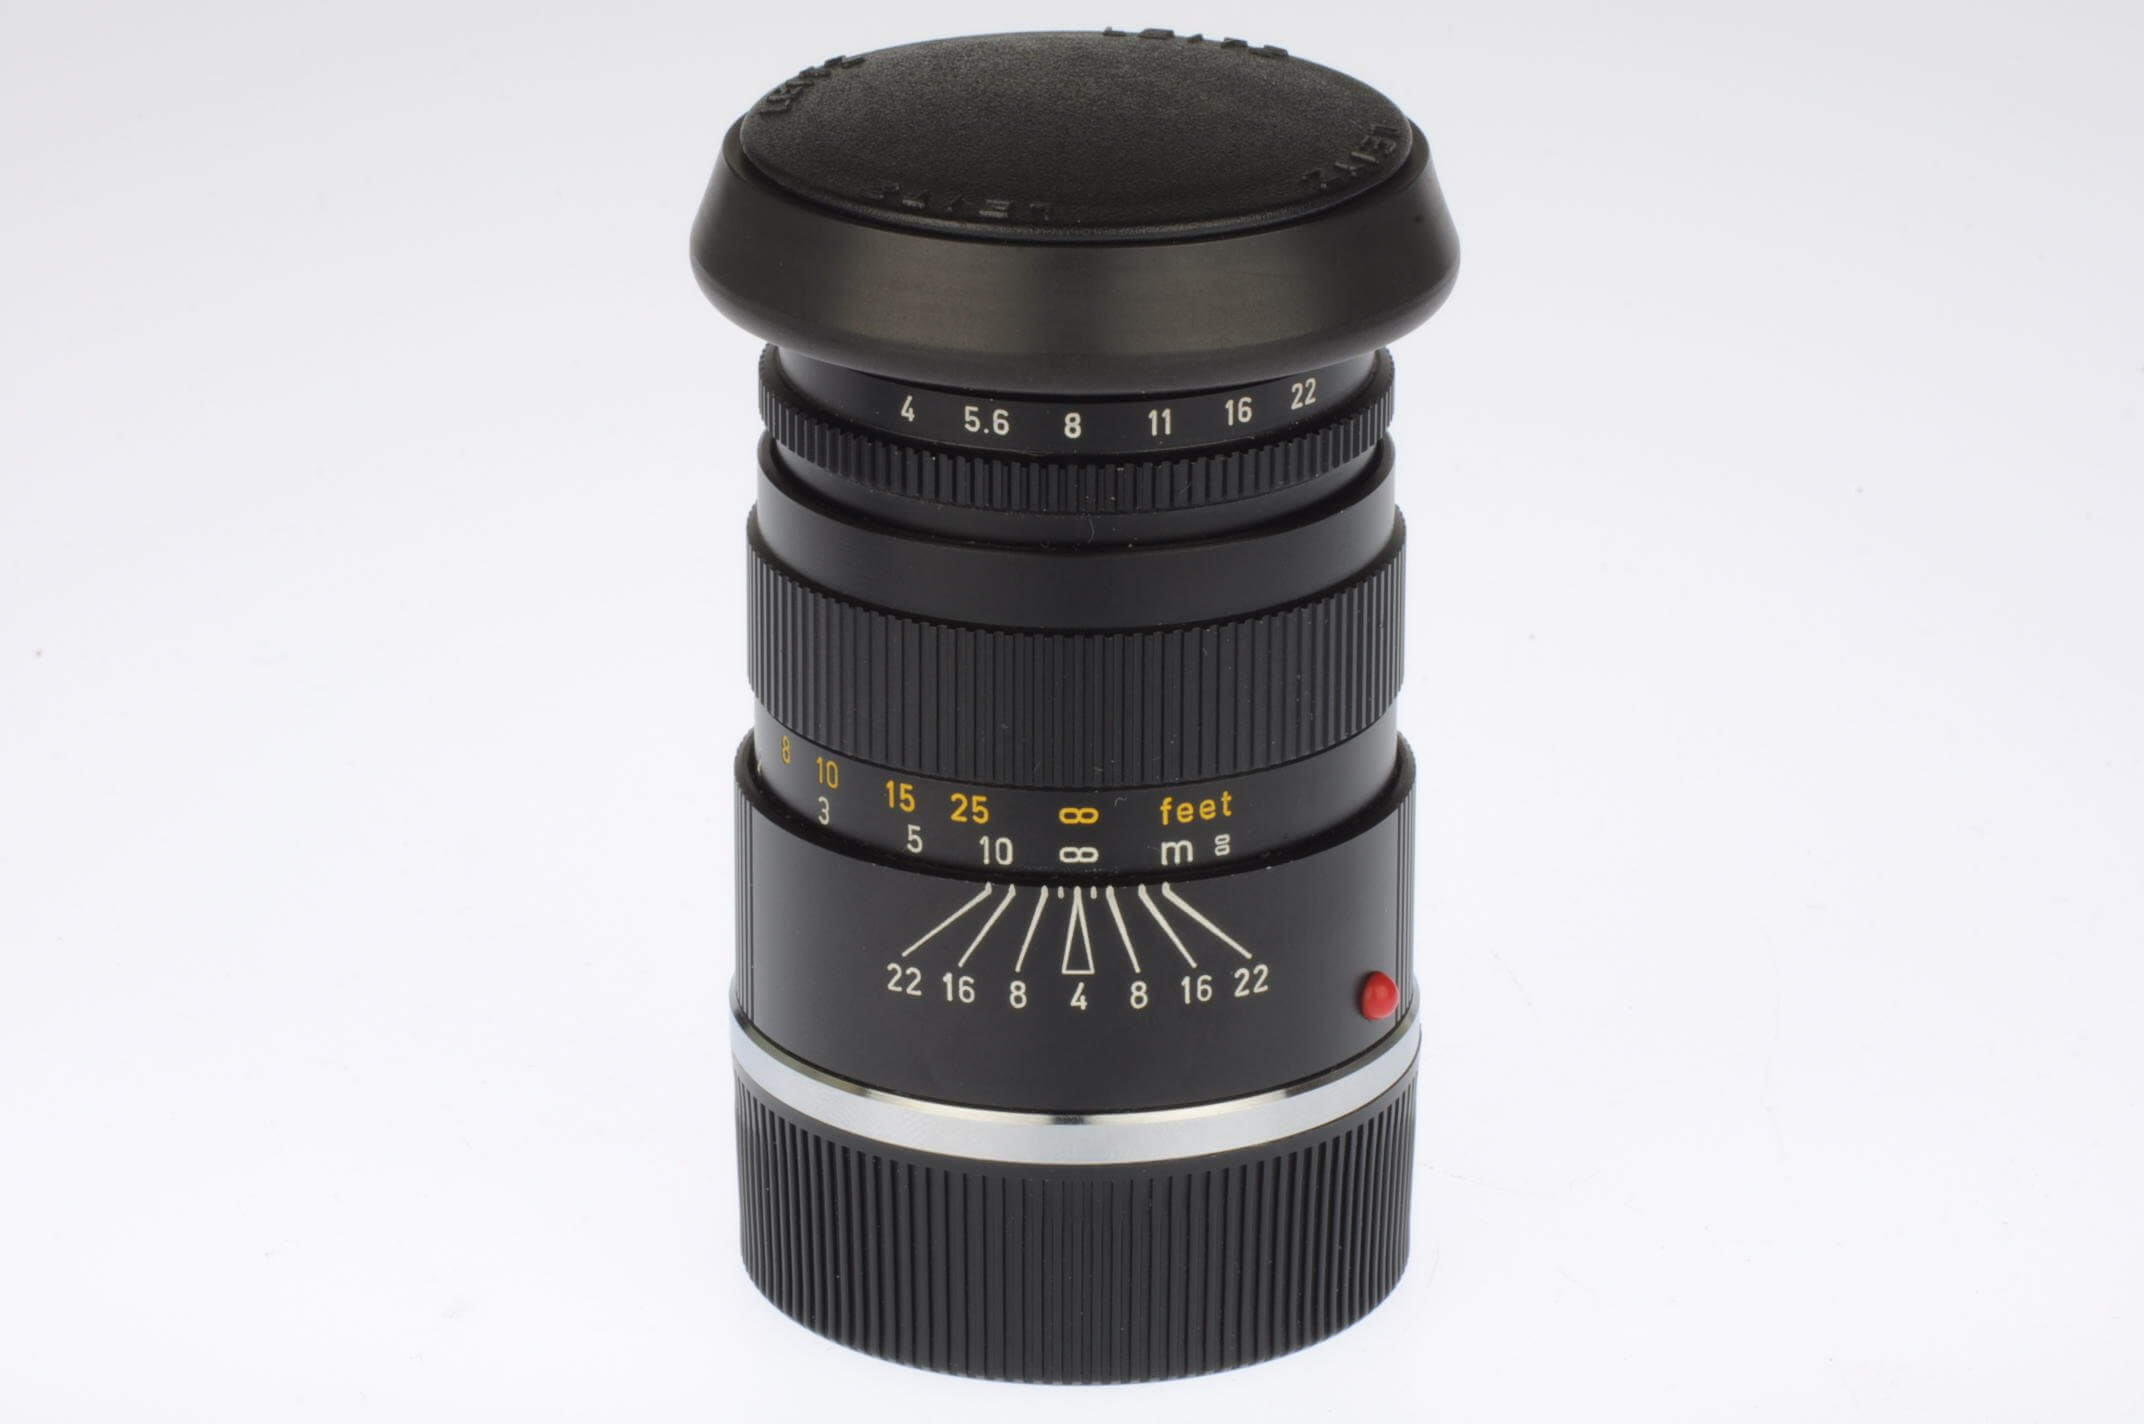 Leica 90mm f4 Elmar C, virtually mint, with correct hood and caps